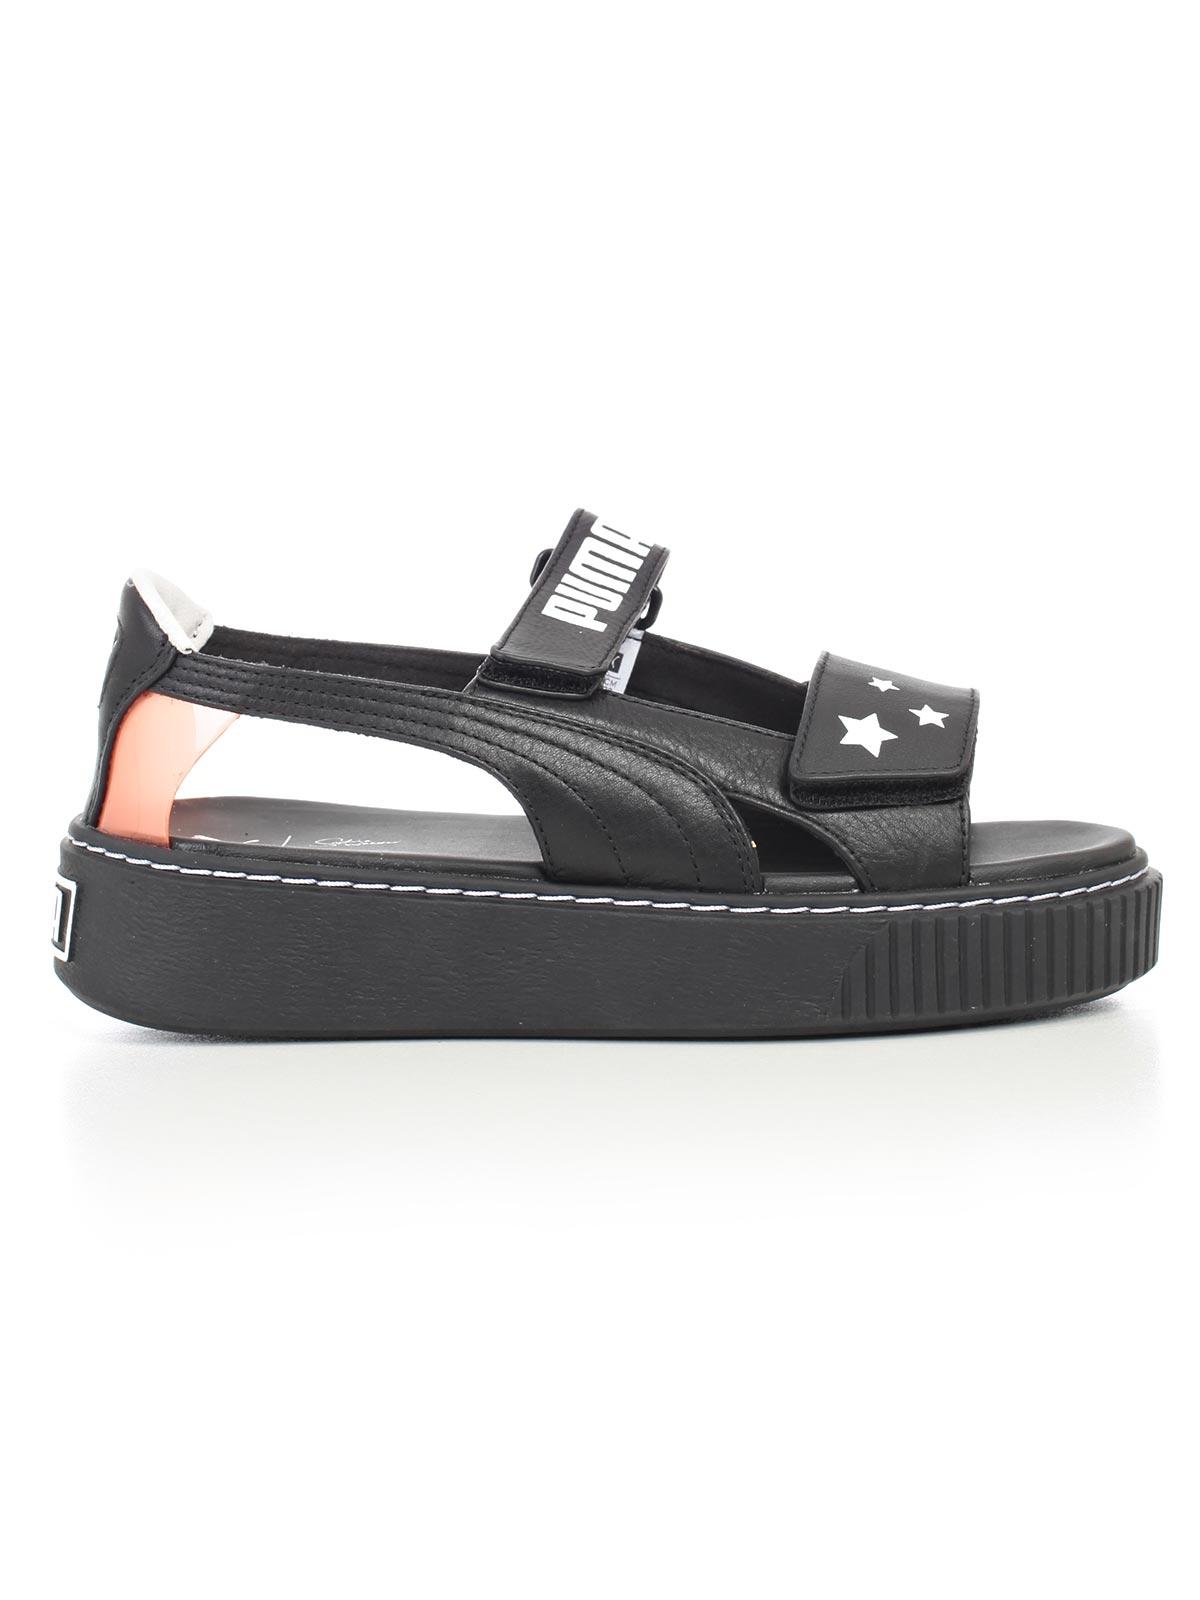 Picture of SOPHIA WEBSTER X PUMA Footwear